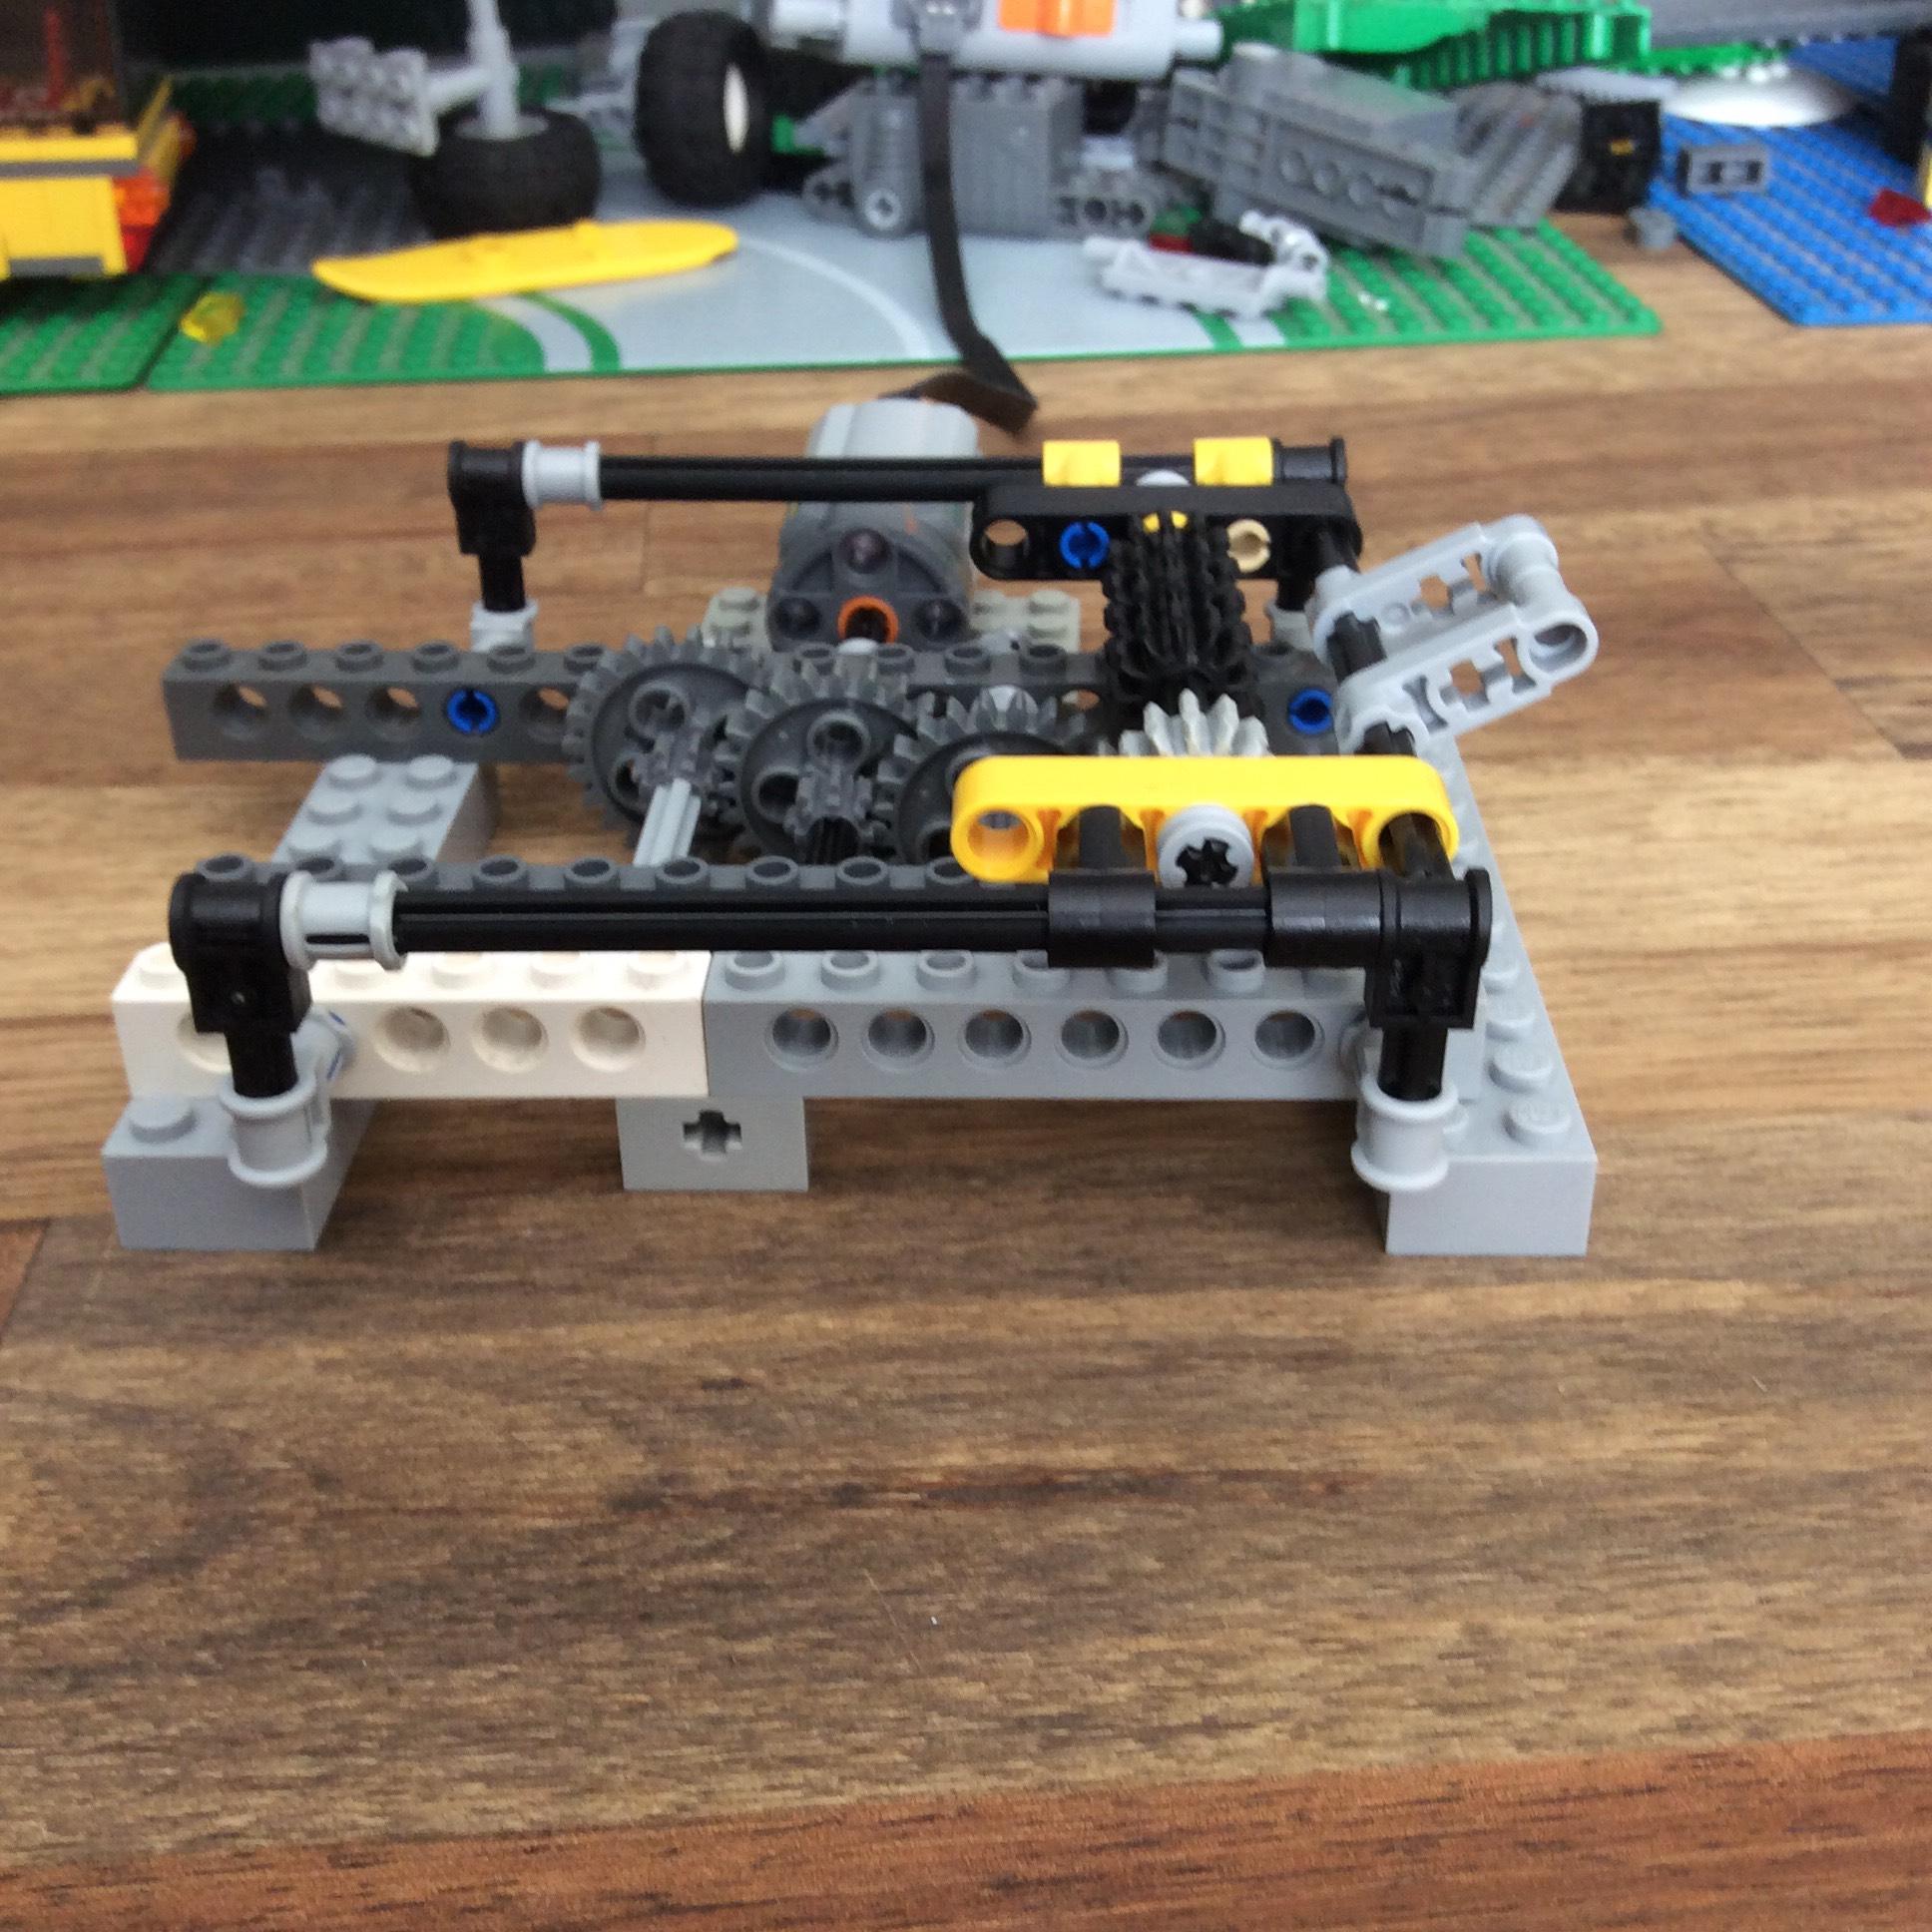 Lego 4 New Black Technic Gearbox 4 x 4 x 1 2//3 Pieces